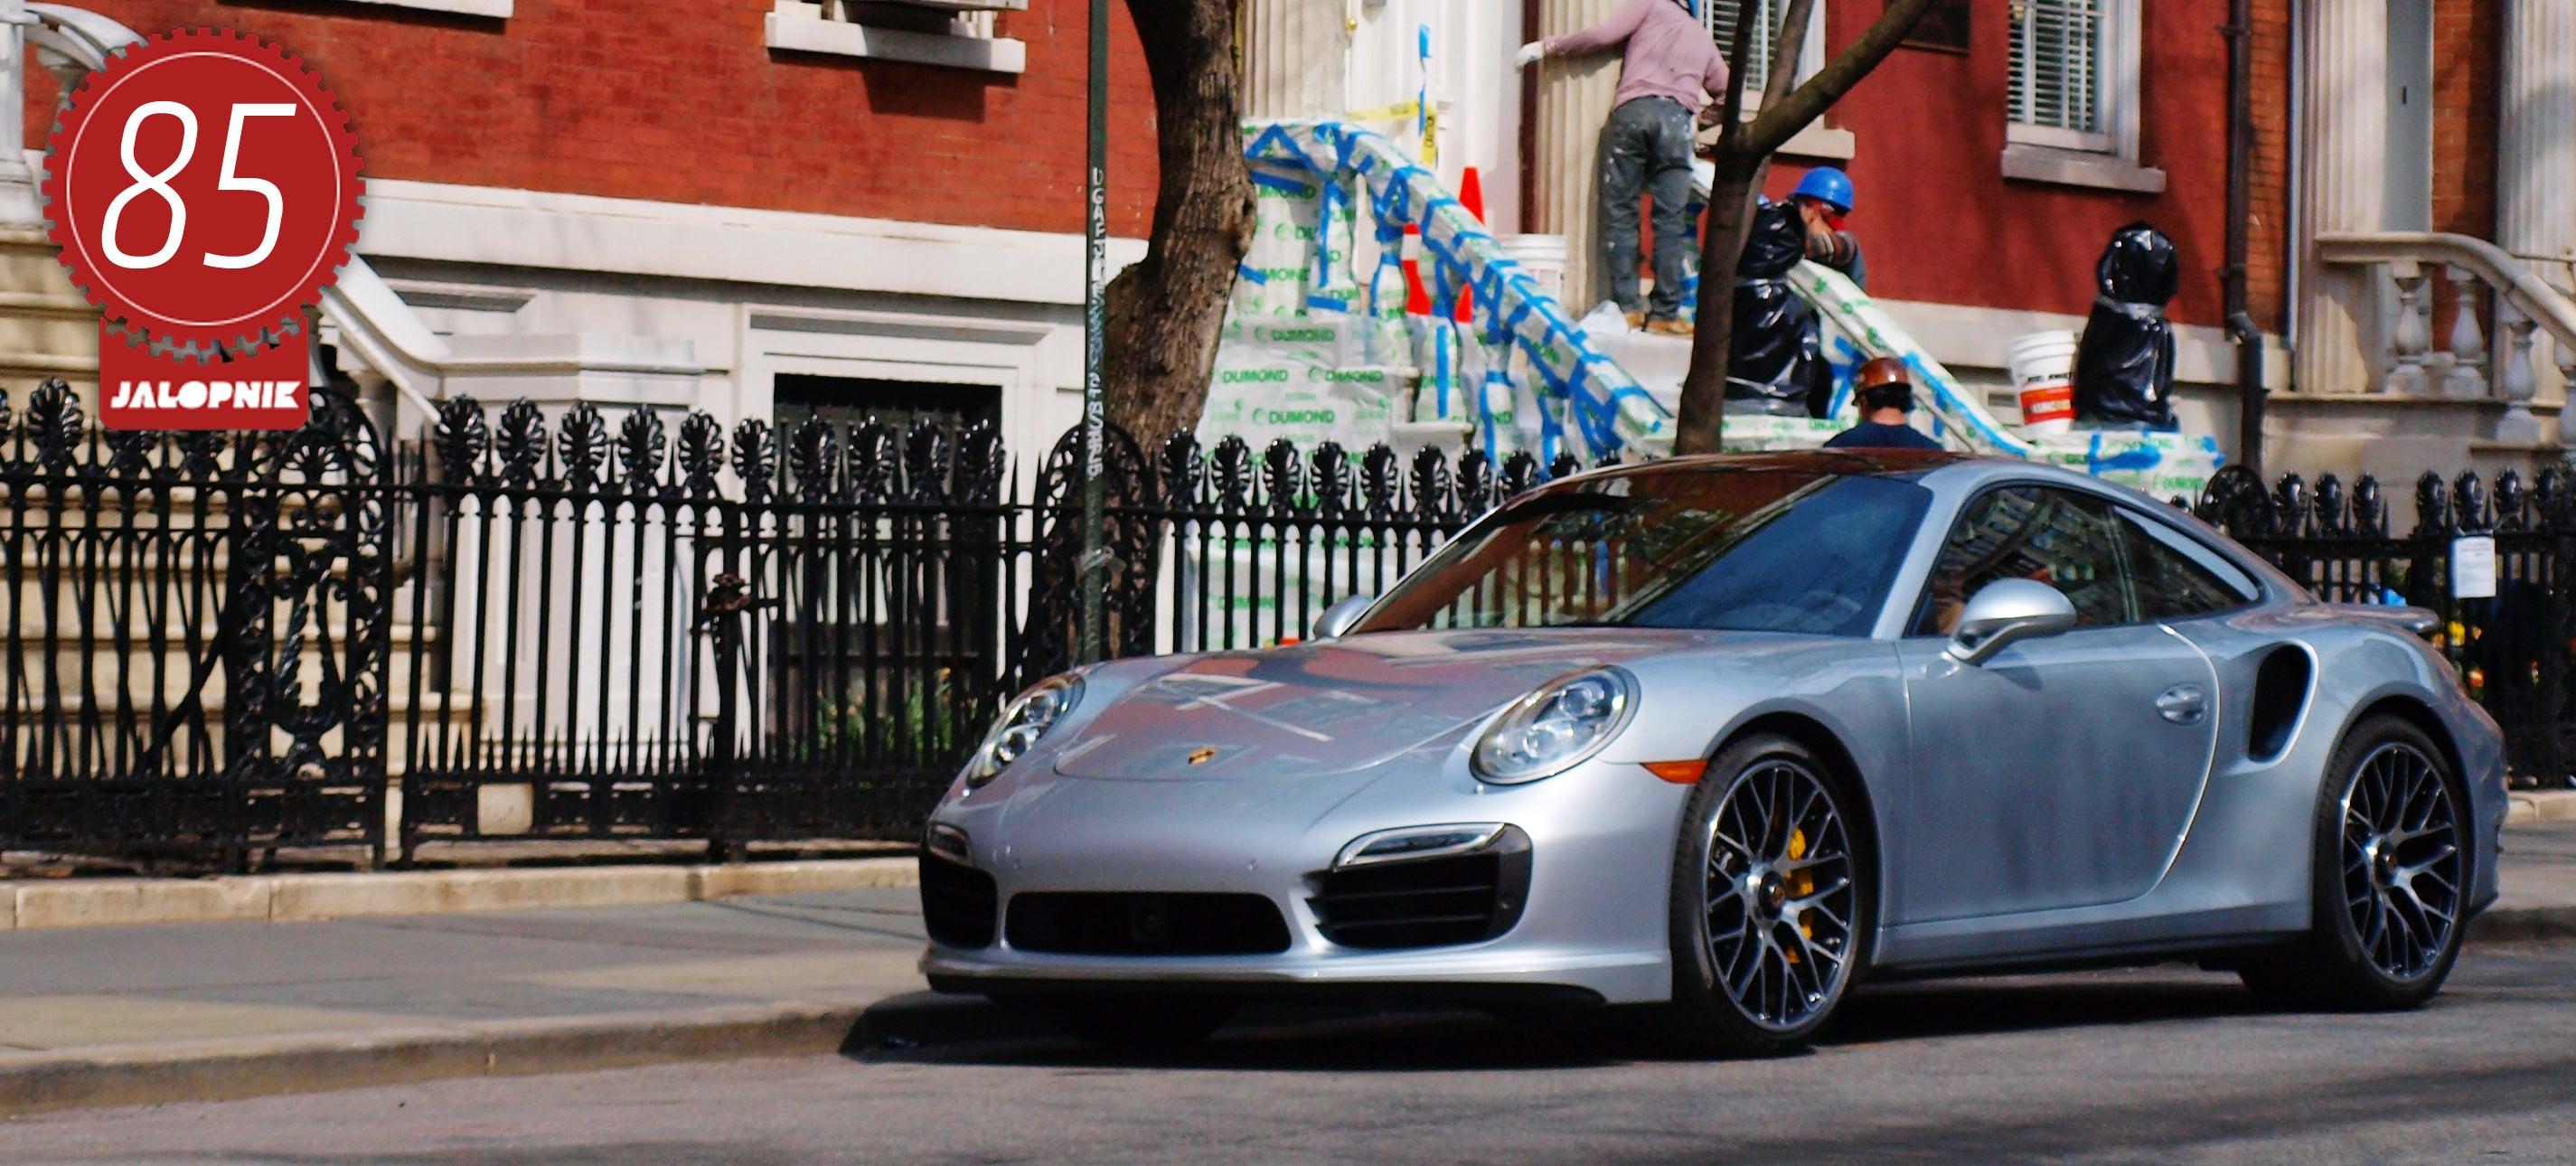 2014 Porsche 911 Turbo S: The Jalopnik Review